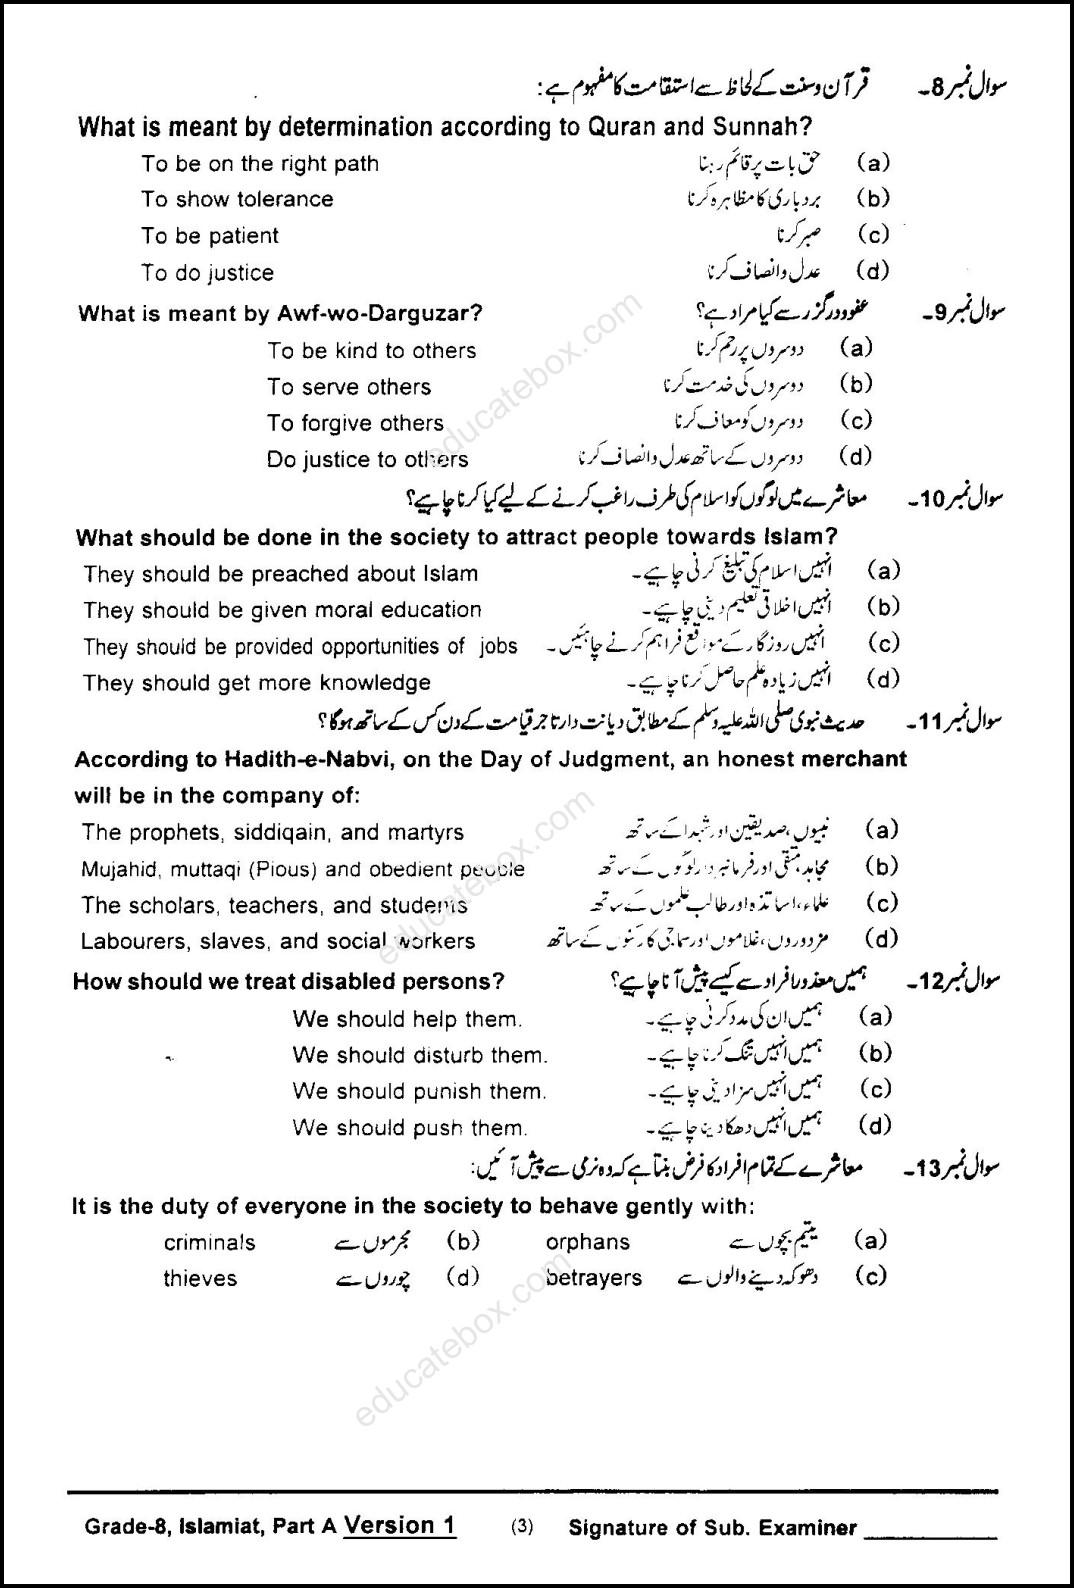 Past Paper Class 8 Islamiat PEC 2015 Part A Objective Ver 3 - Page 3